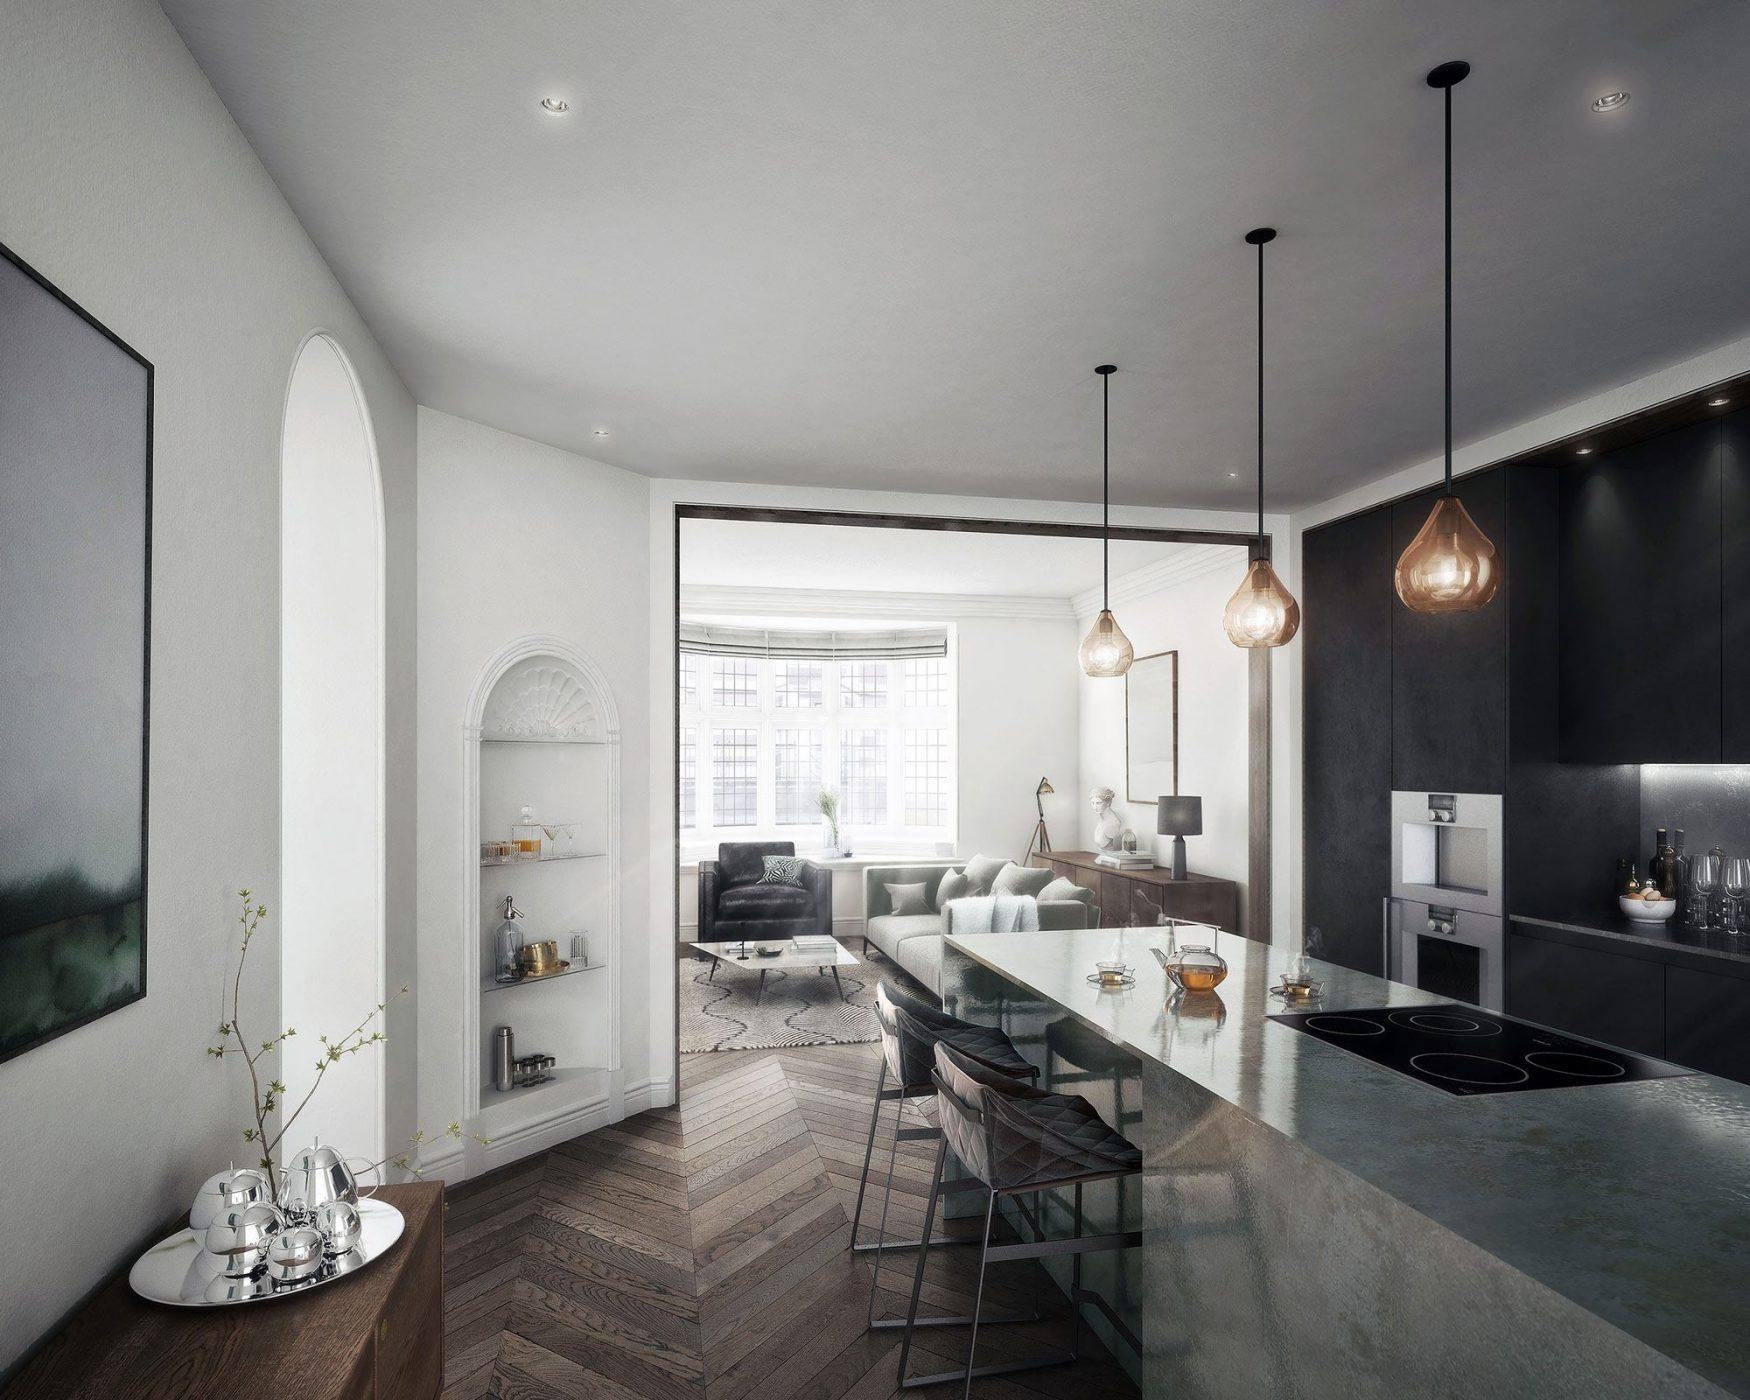 33 Bury Street by Morrow + Lorraine Architects